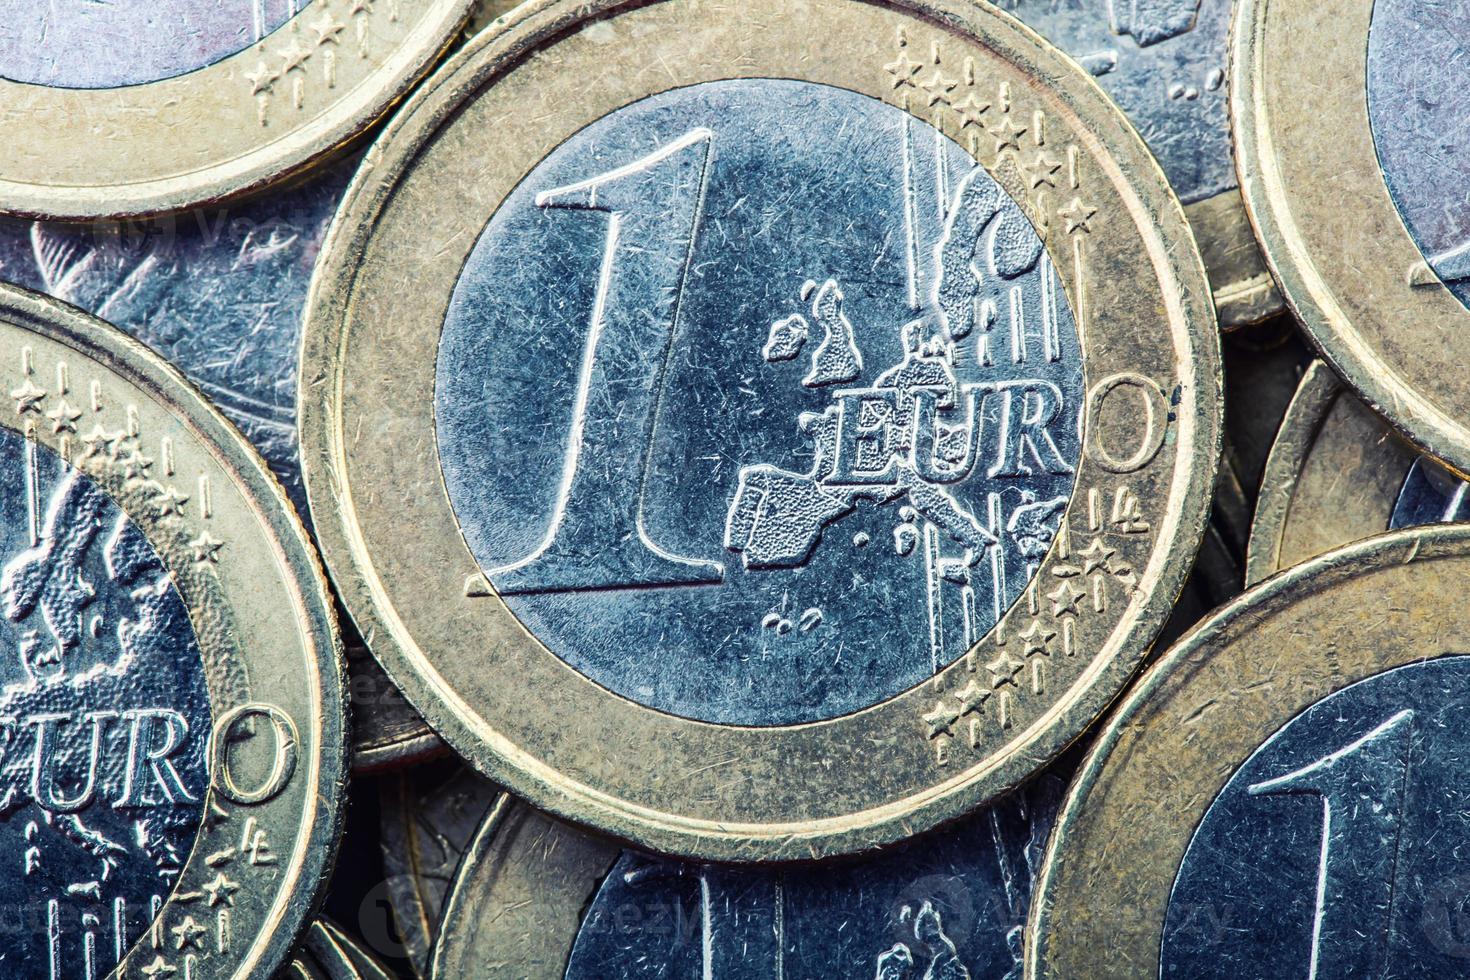 monedas de euro dinero del euro moneda euro. foto